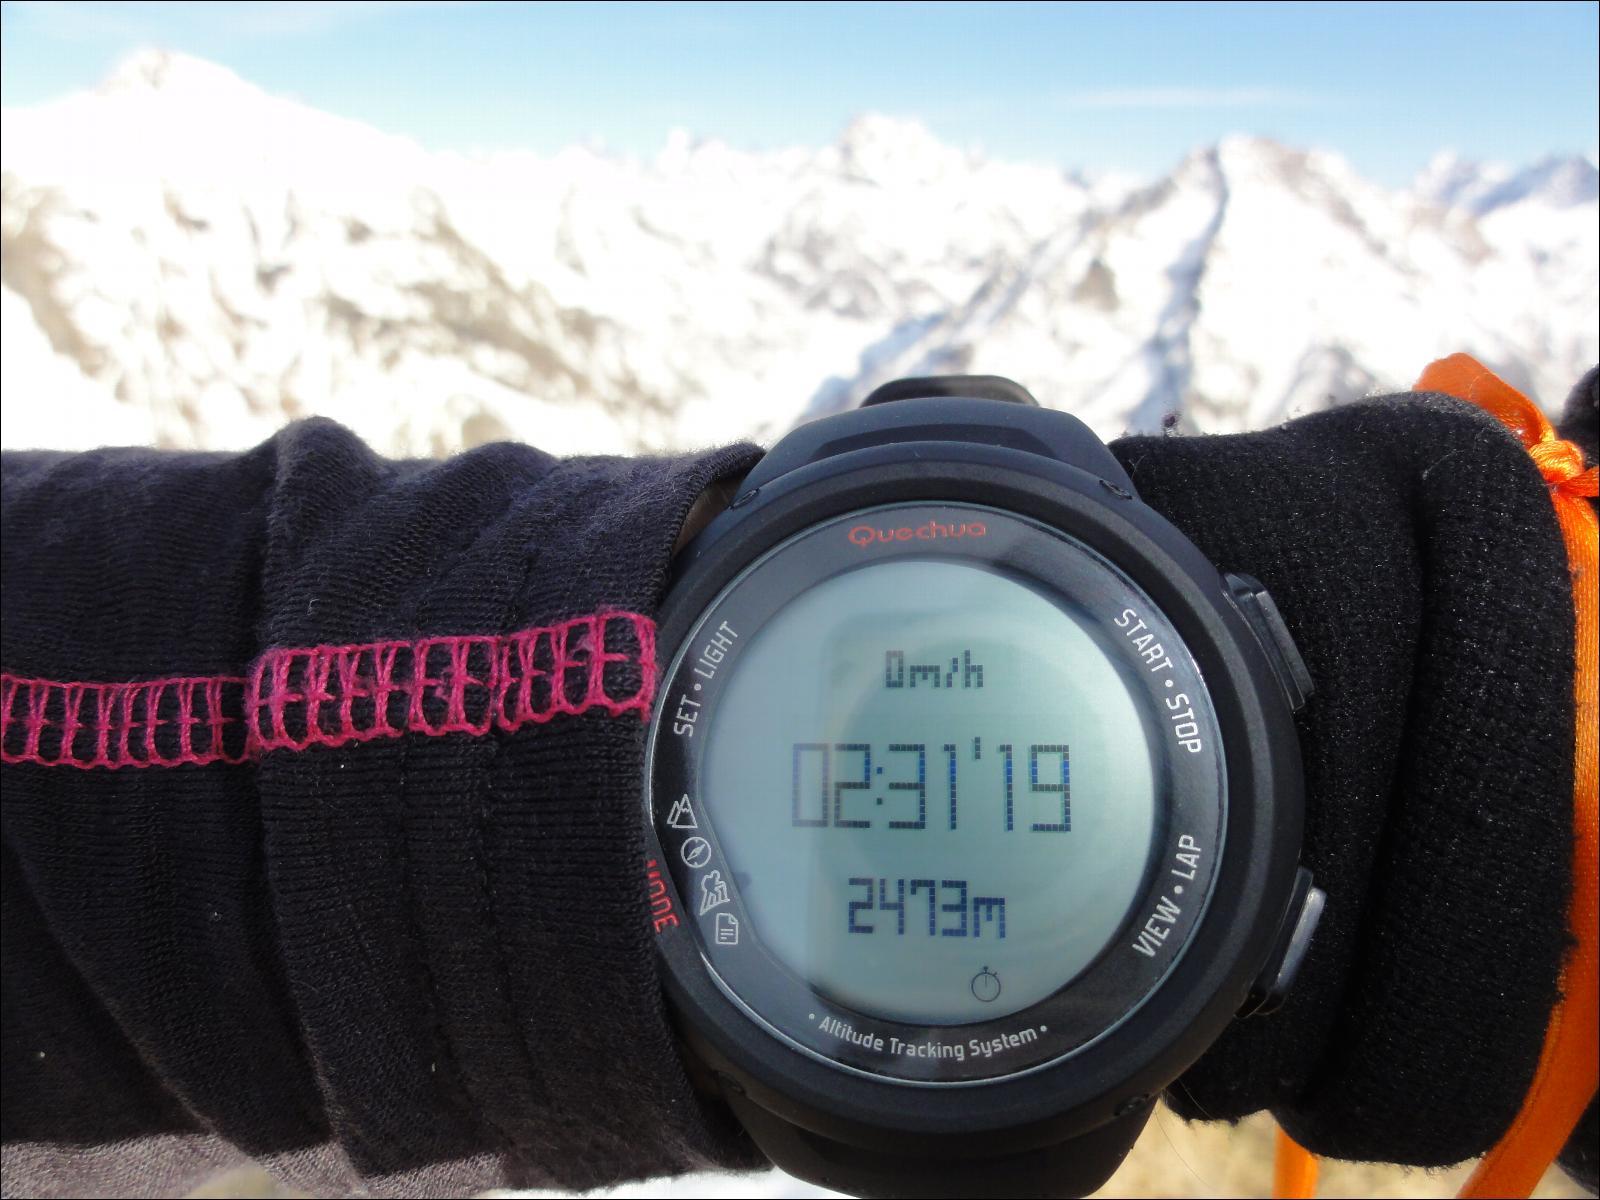 bas prix 12b05 ae422 Montre altimètre W Quechua 700